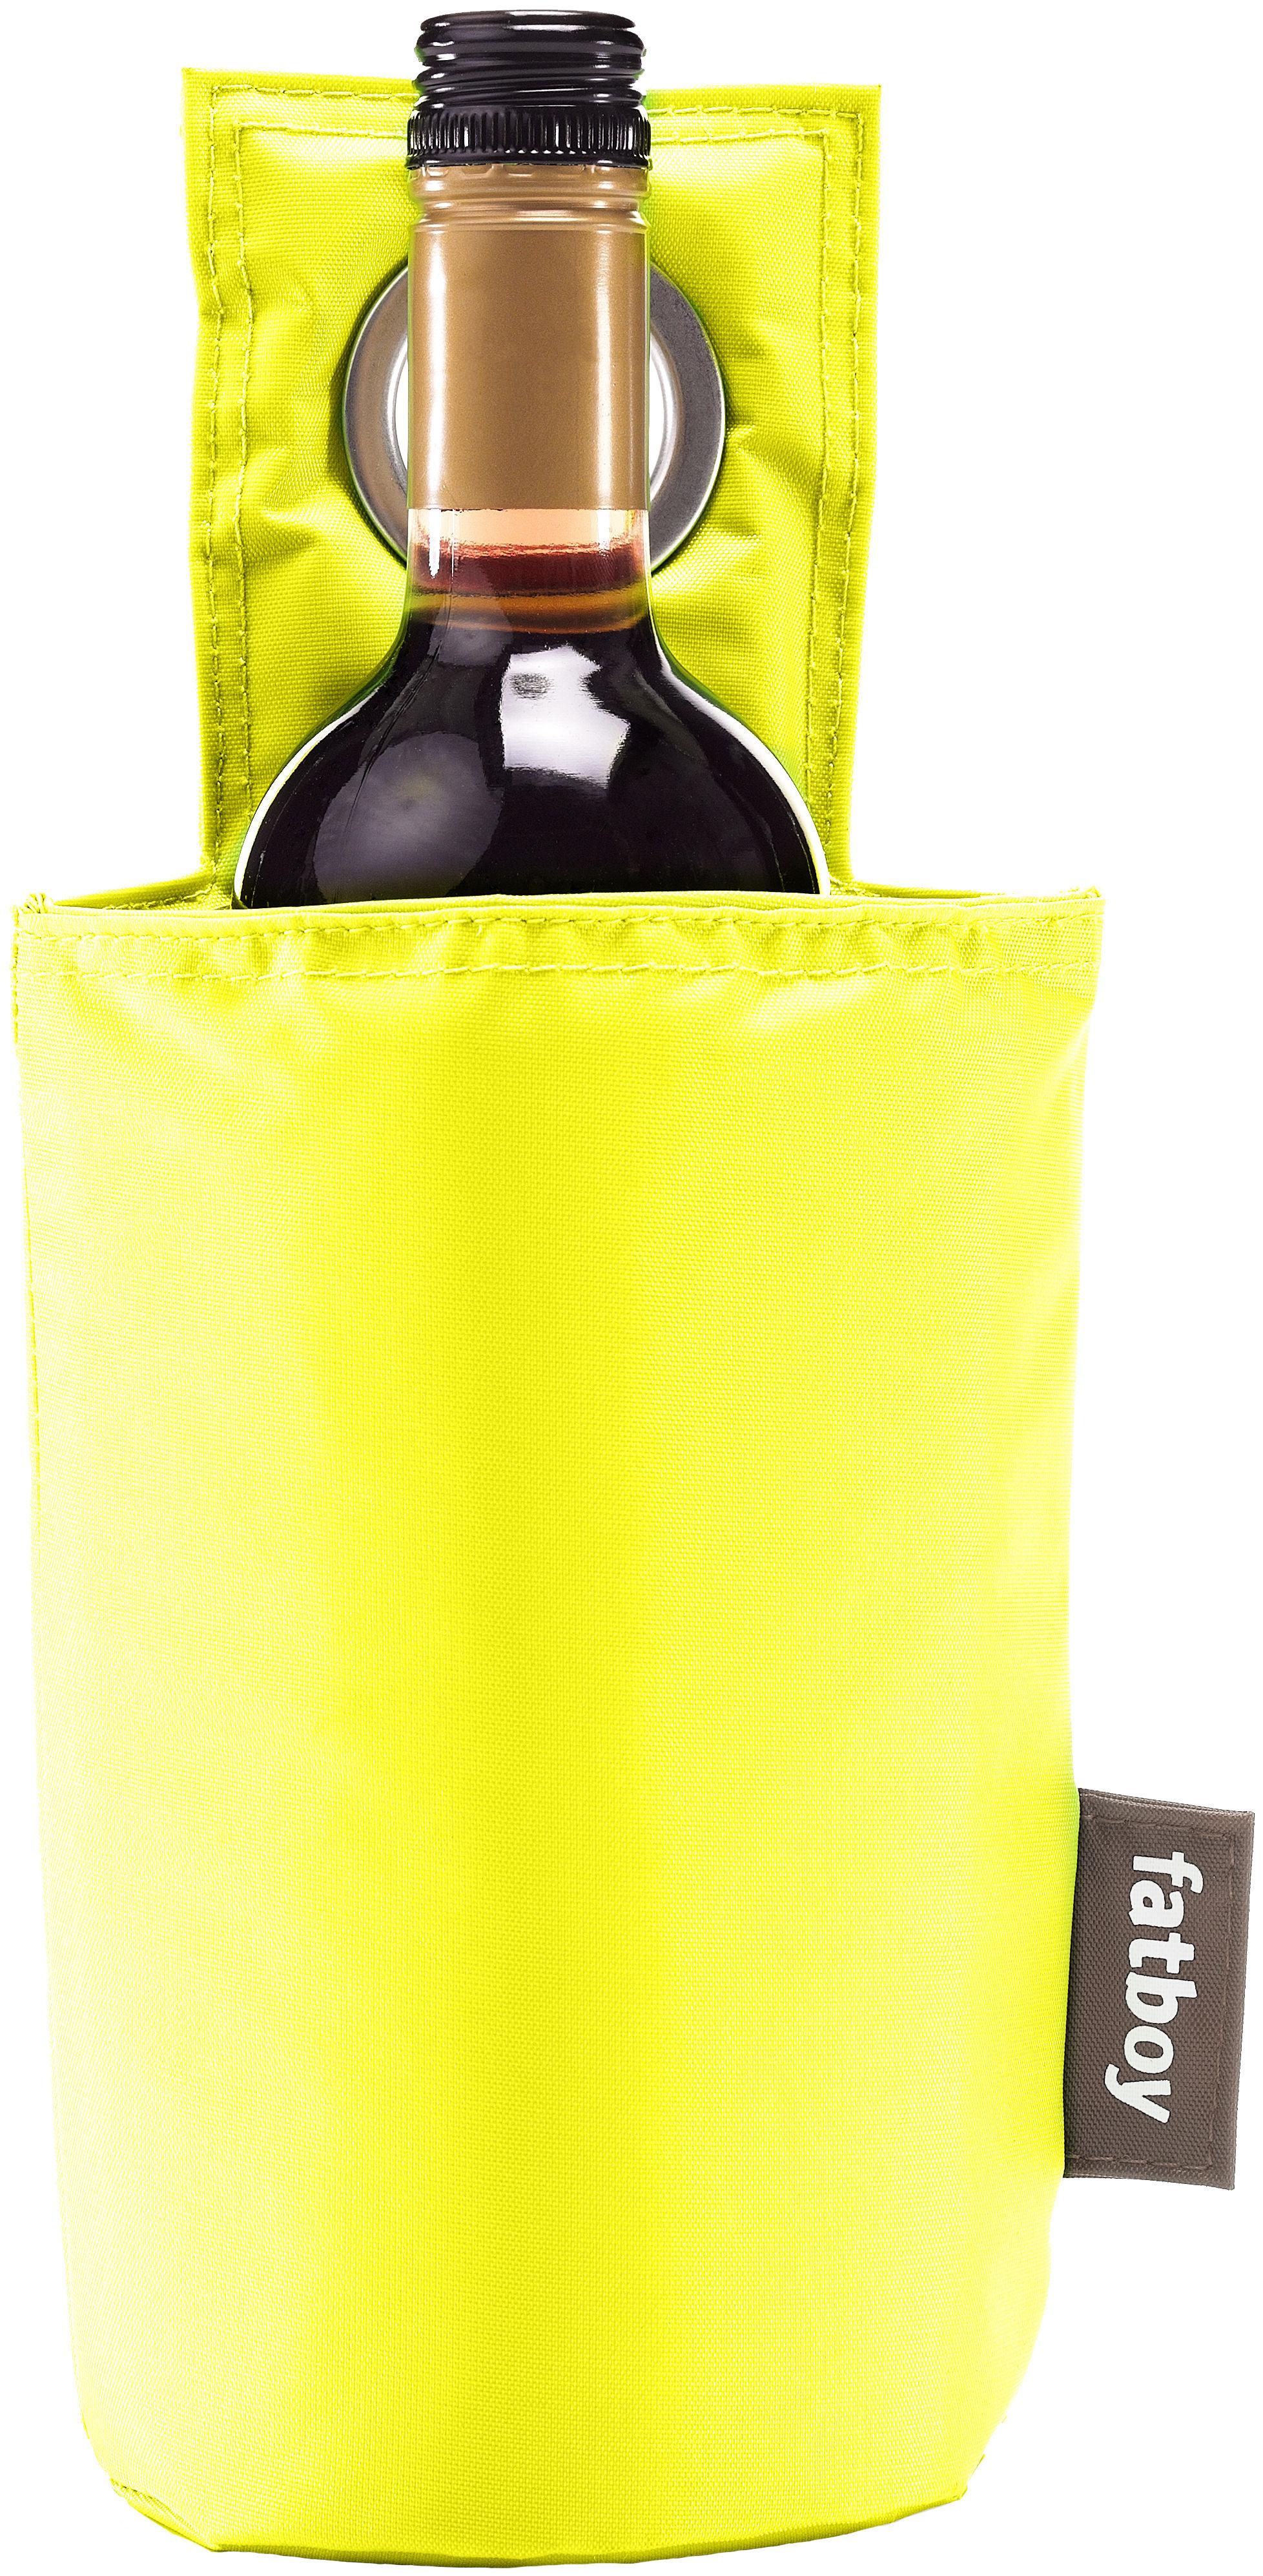 wayne cooler fluo limitierte auflage fatboy flaschenk hler. Black Bedroom Furniture Sets. Home Design Ideas